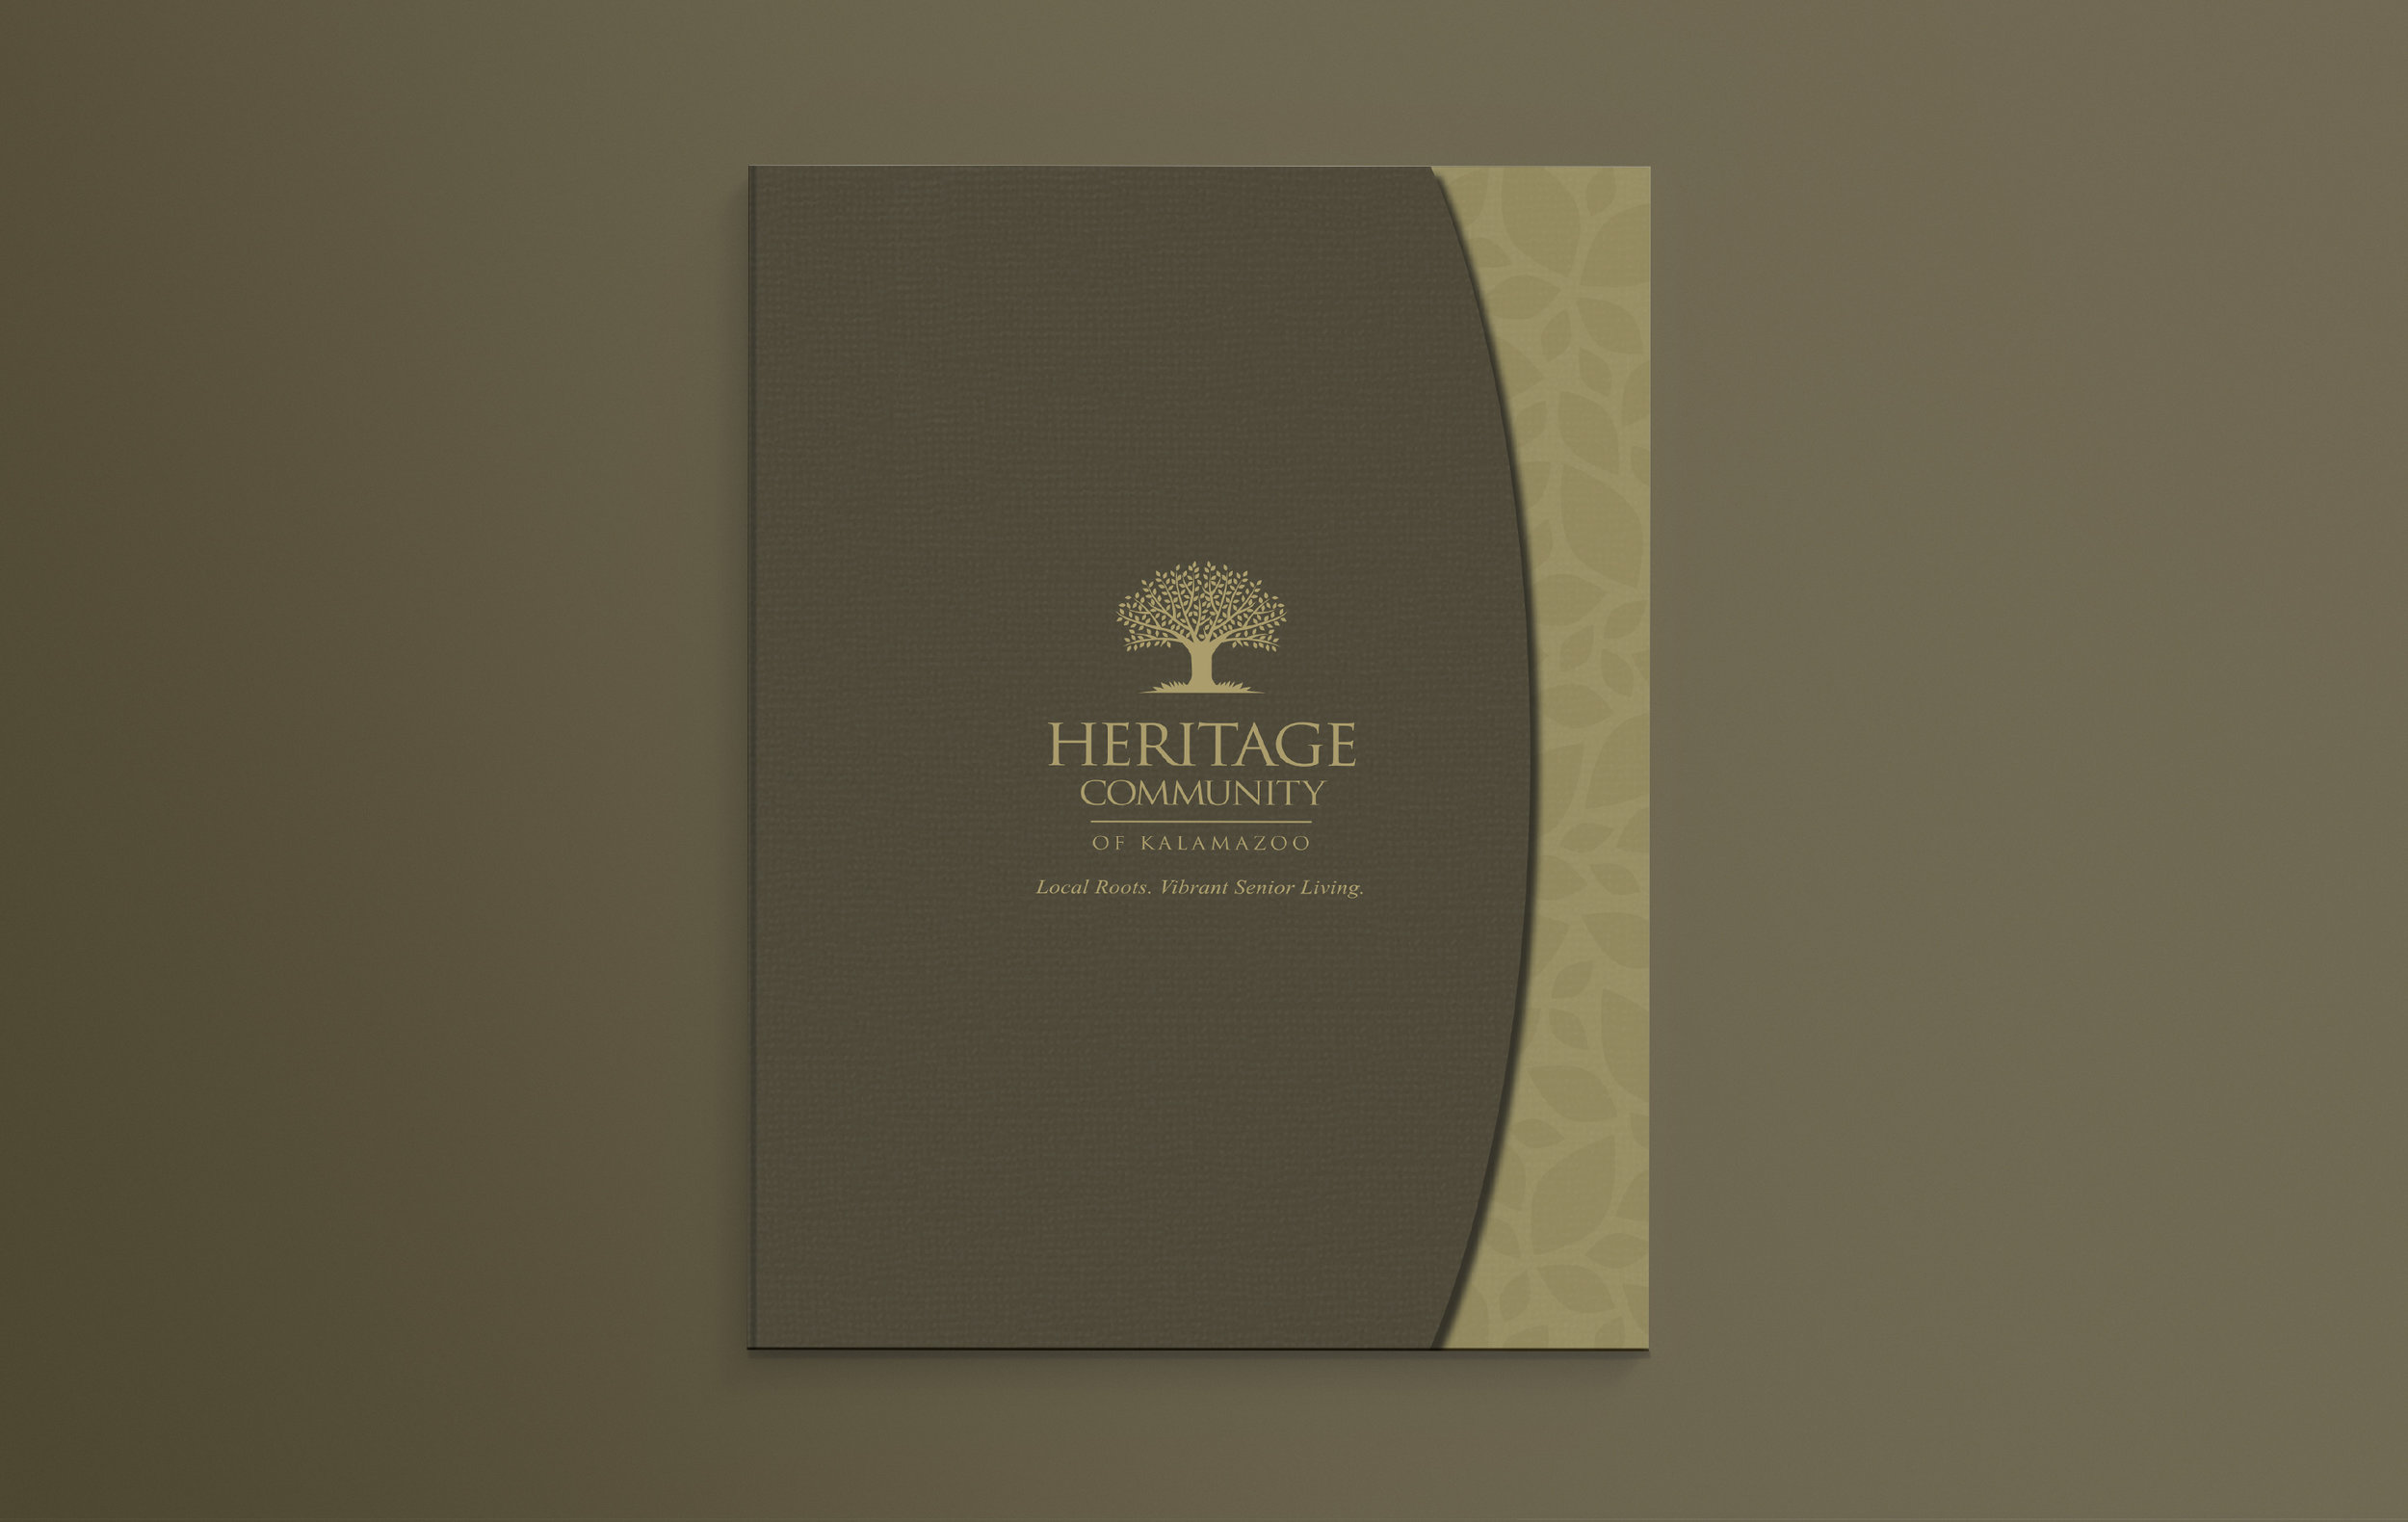 HeritageFoundationBrochure-Cover01.jpg